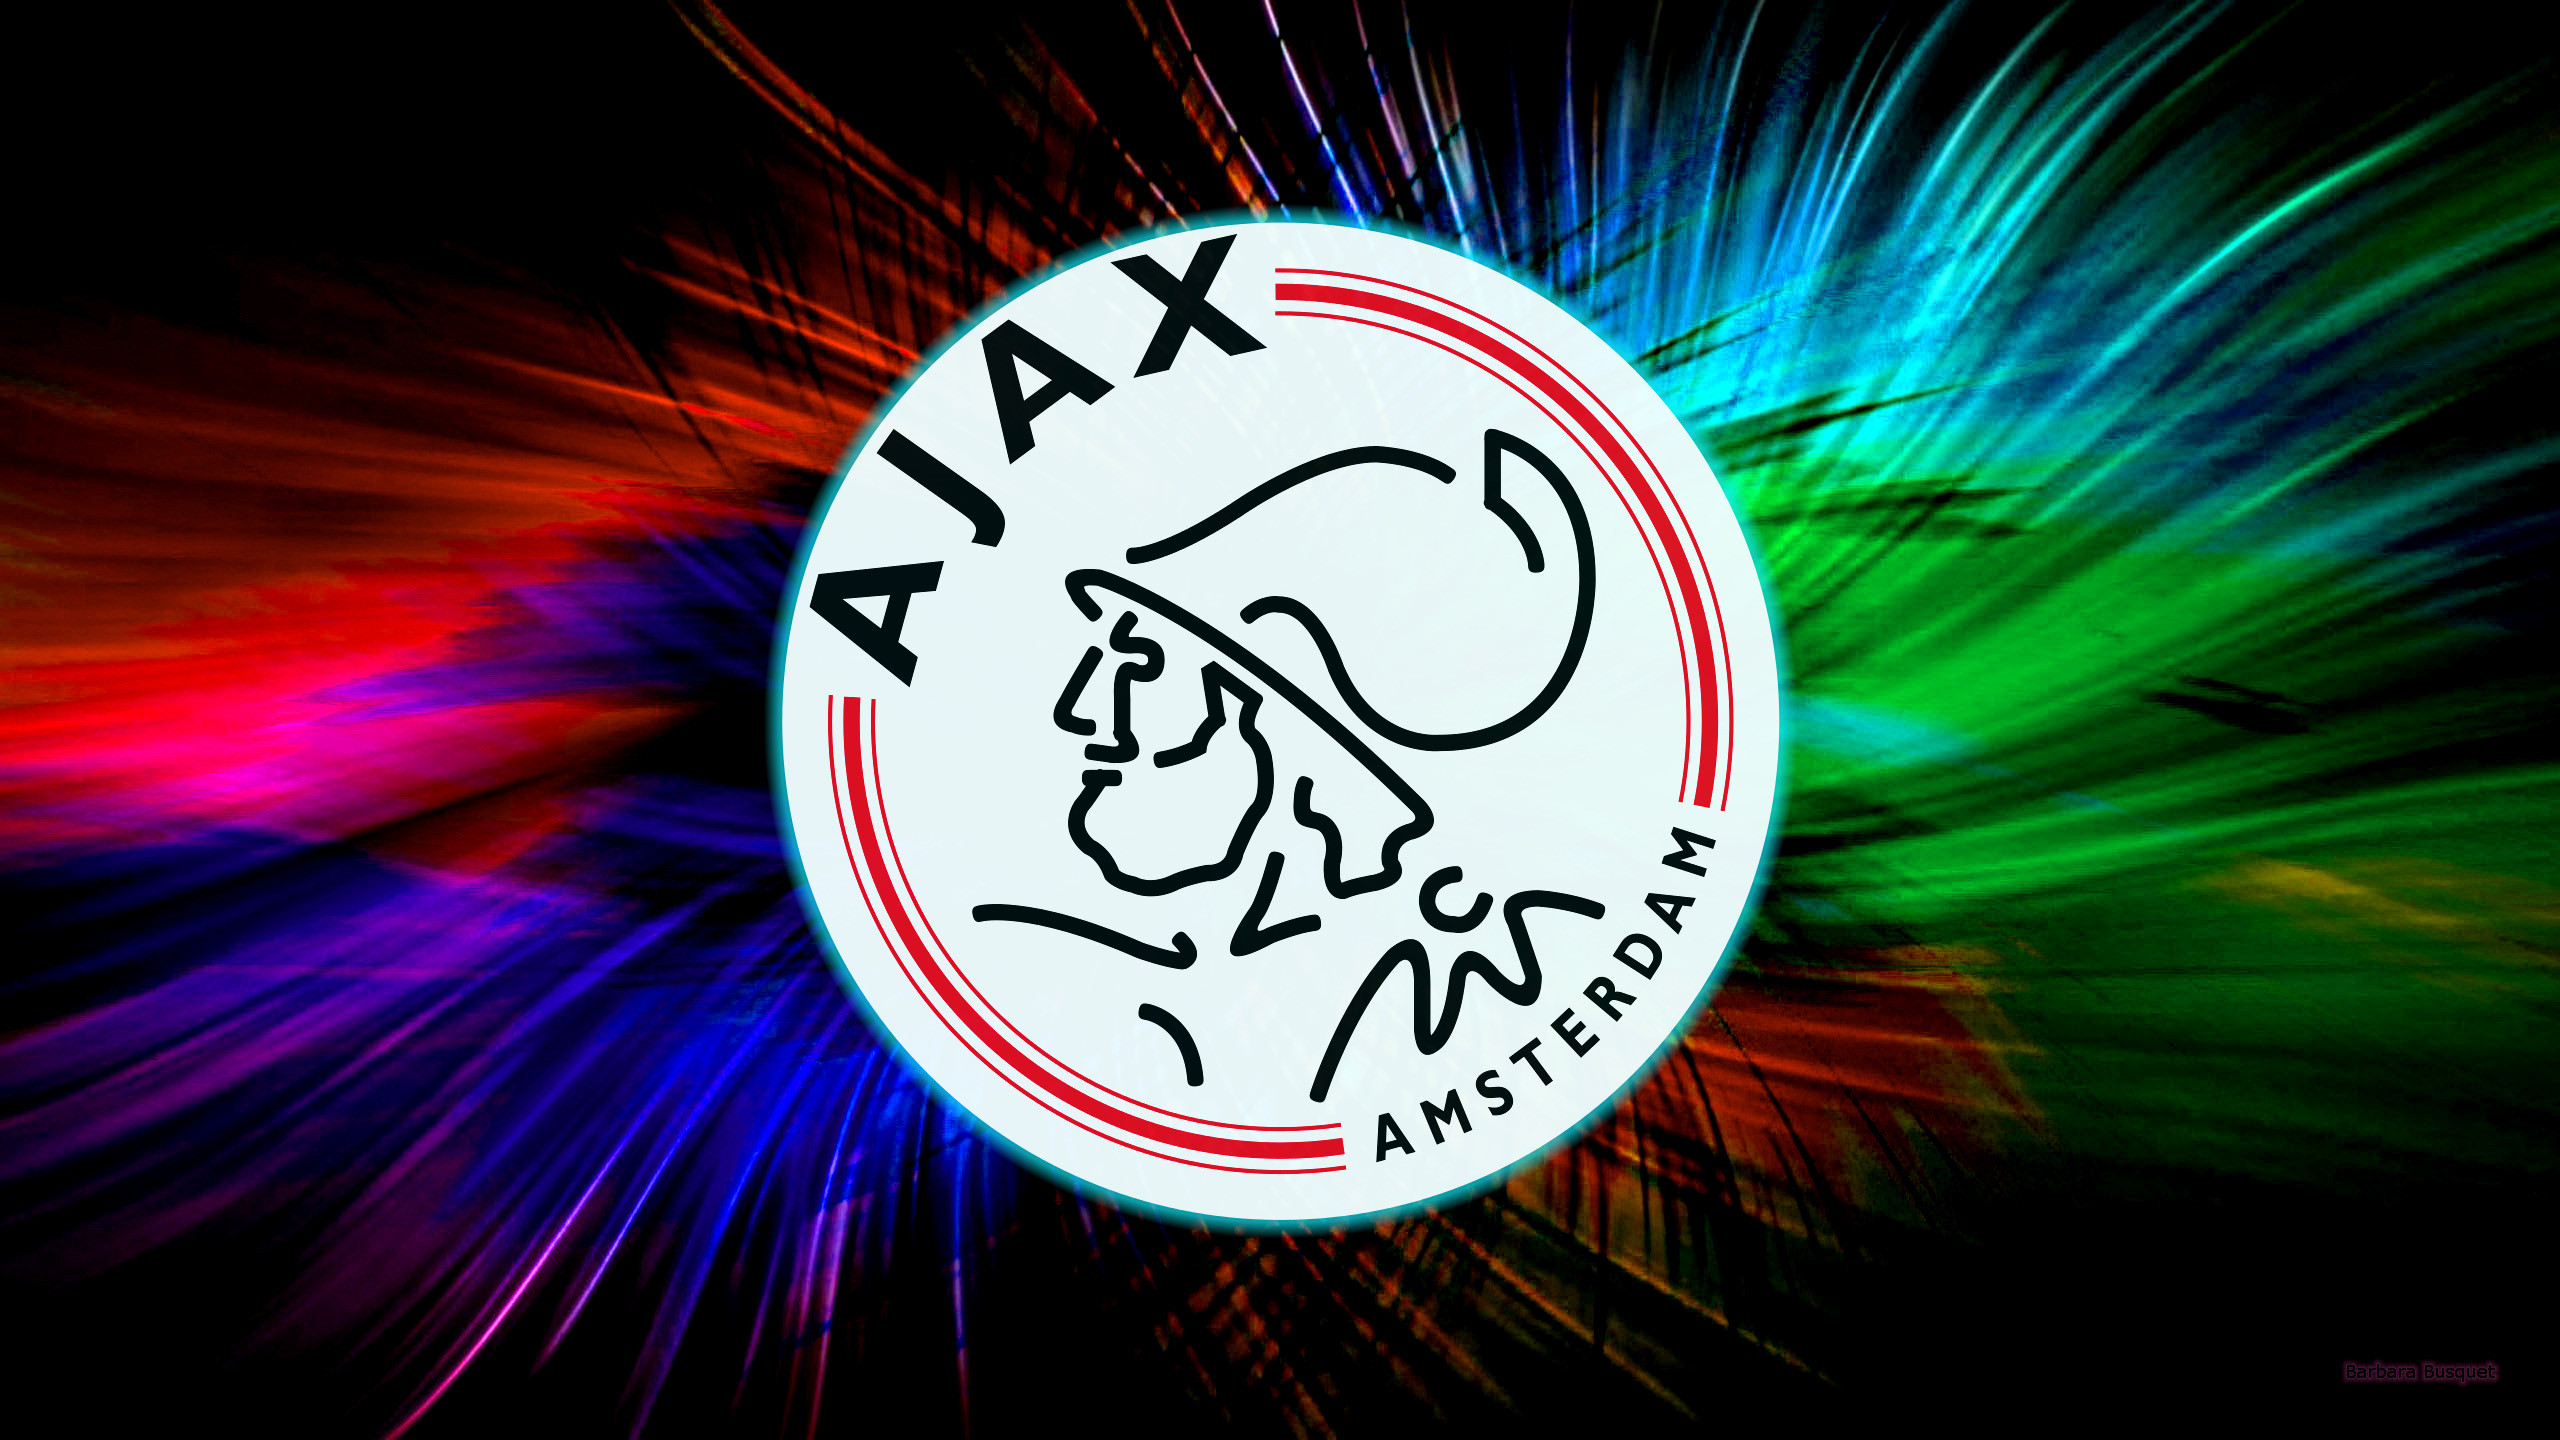 Ajax Amsterdam Barbaras Hd Wallpapers